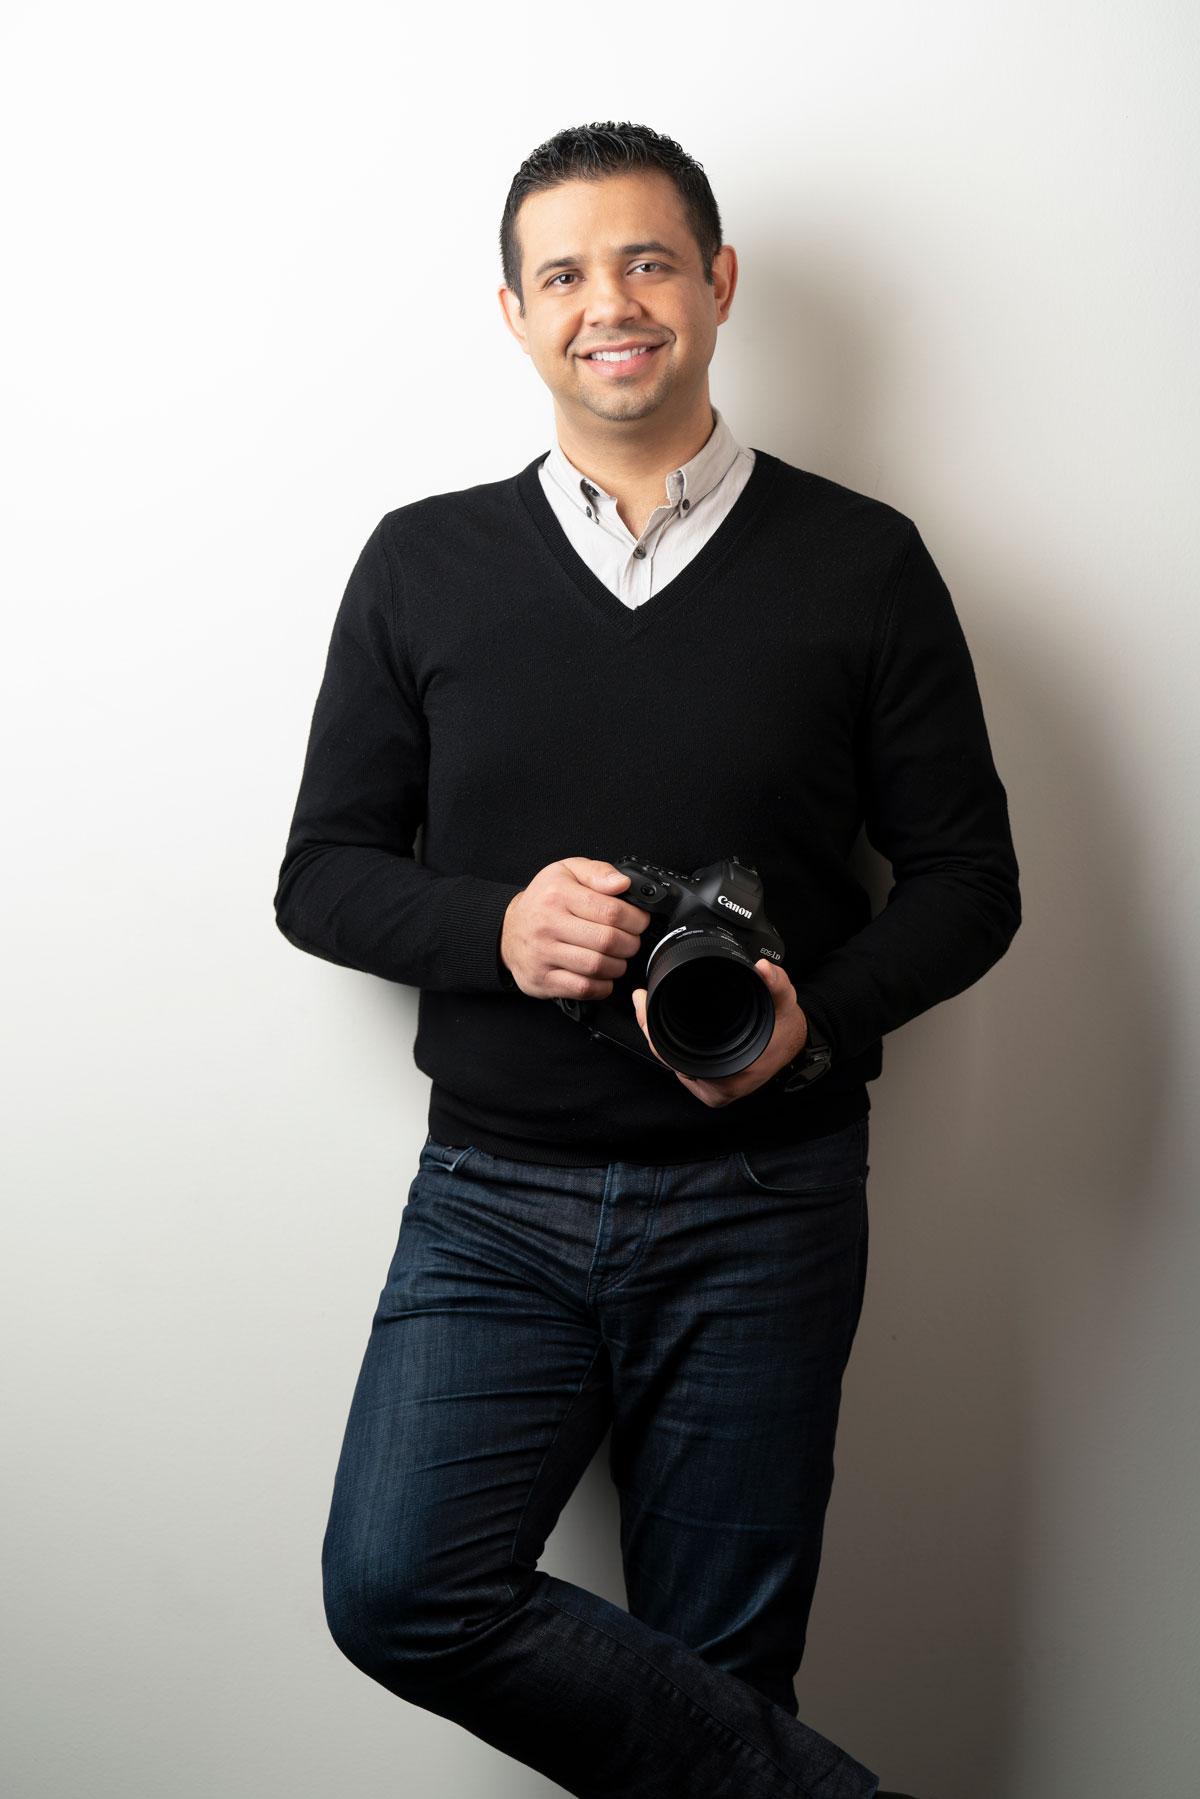 Arvin Eskandarnia Wedding photographer in Washington DC area